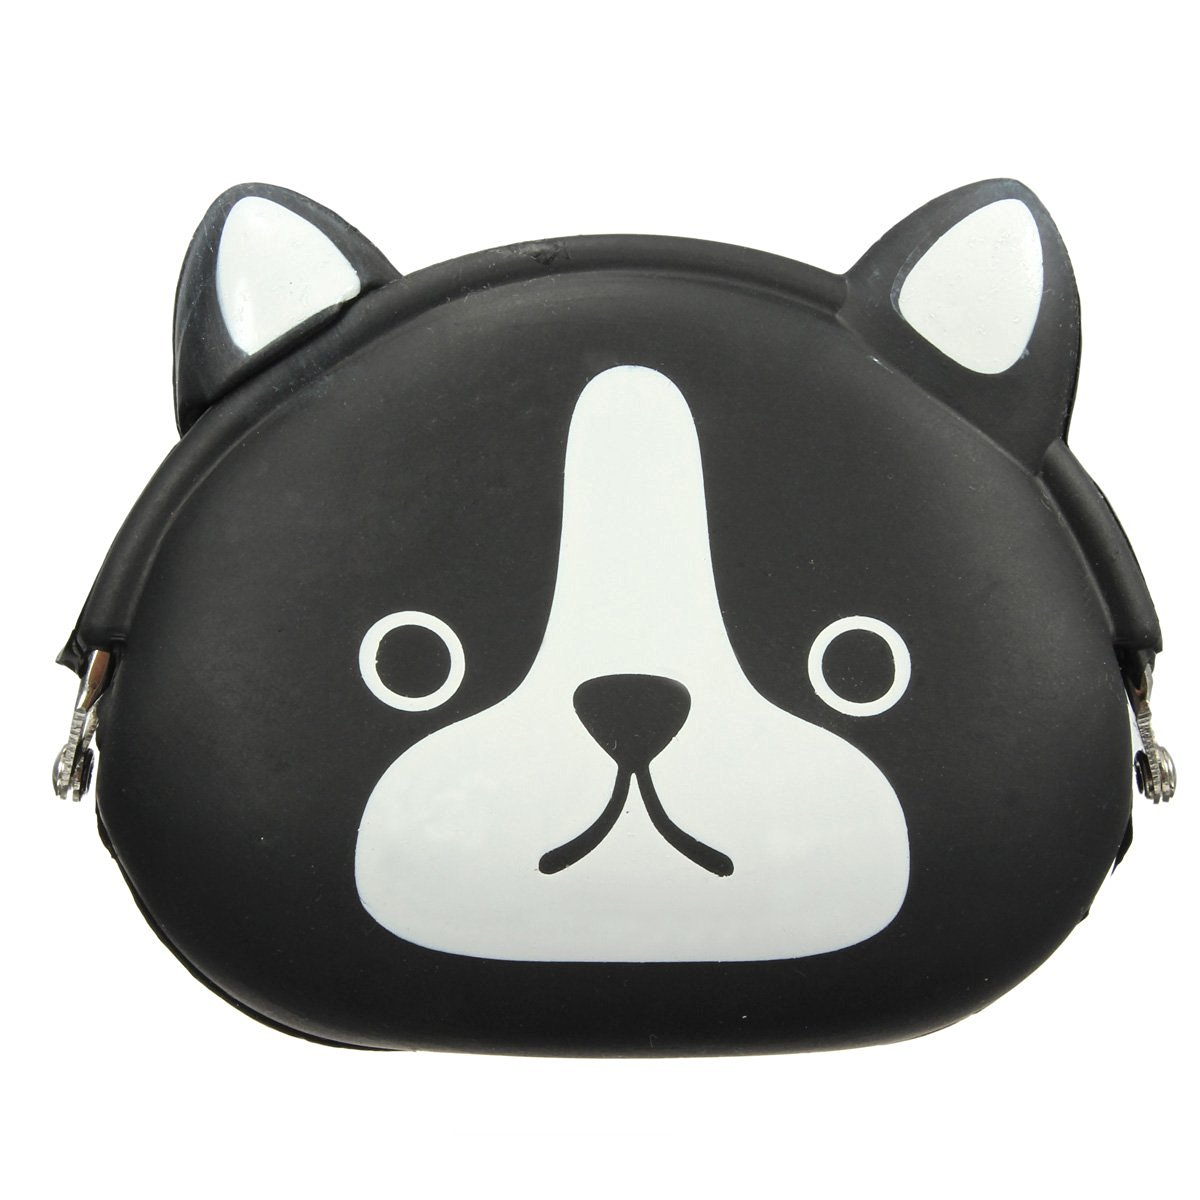 Women Girls Wallet Kawaii Cute Cartoon Animal Silicone Jelly Coin Bag Purse Kids Gift Black dog